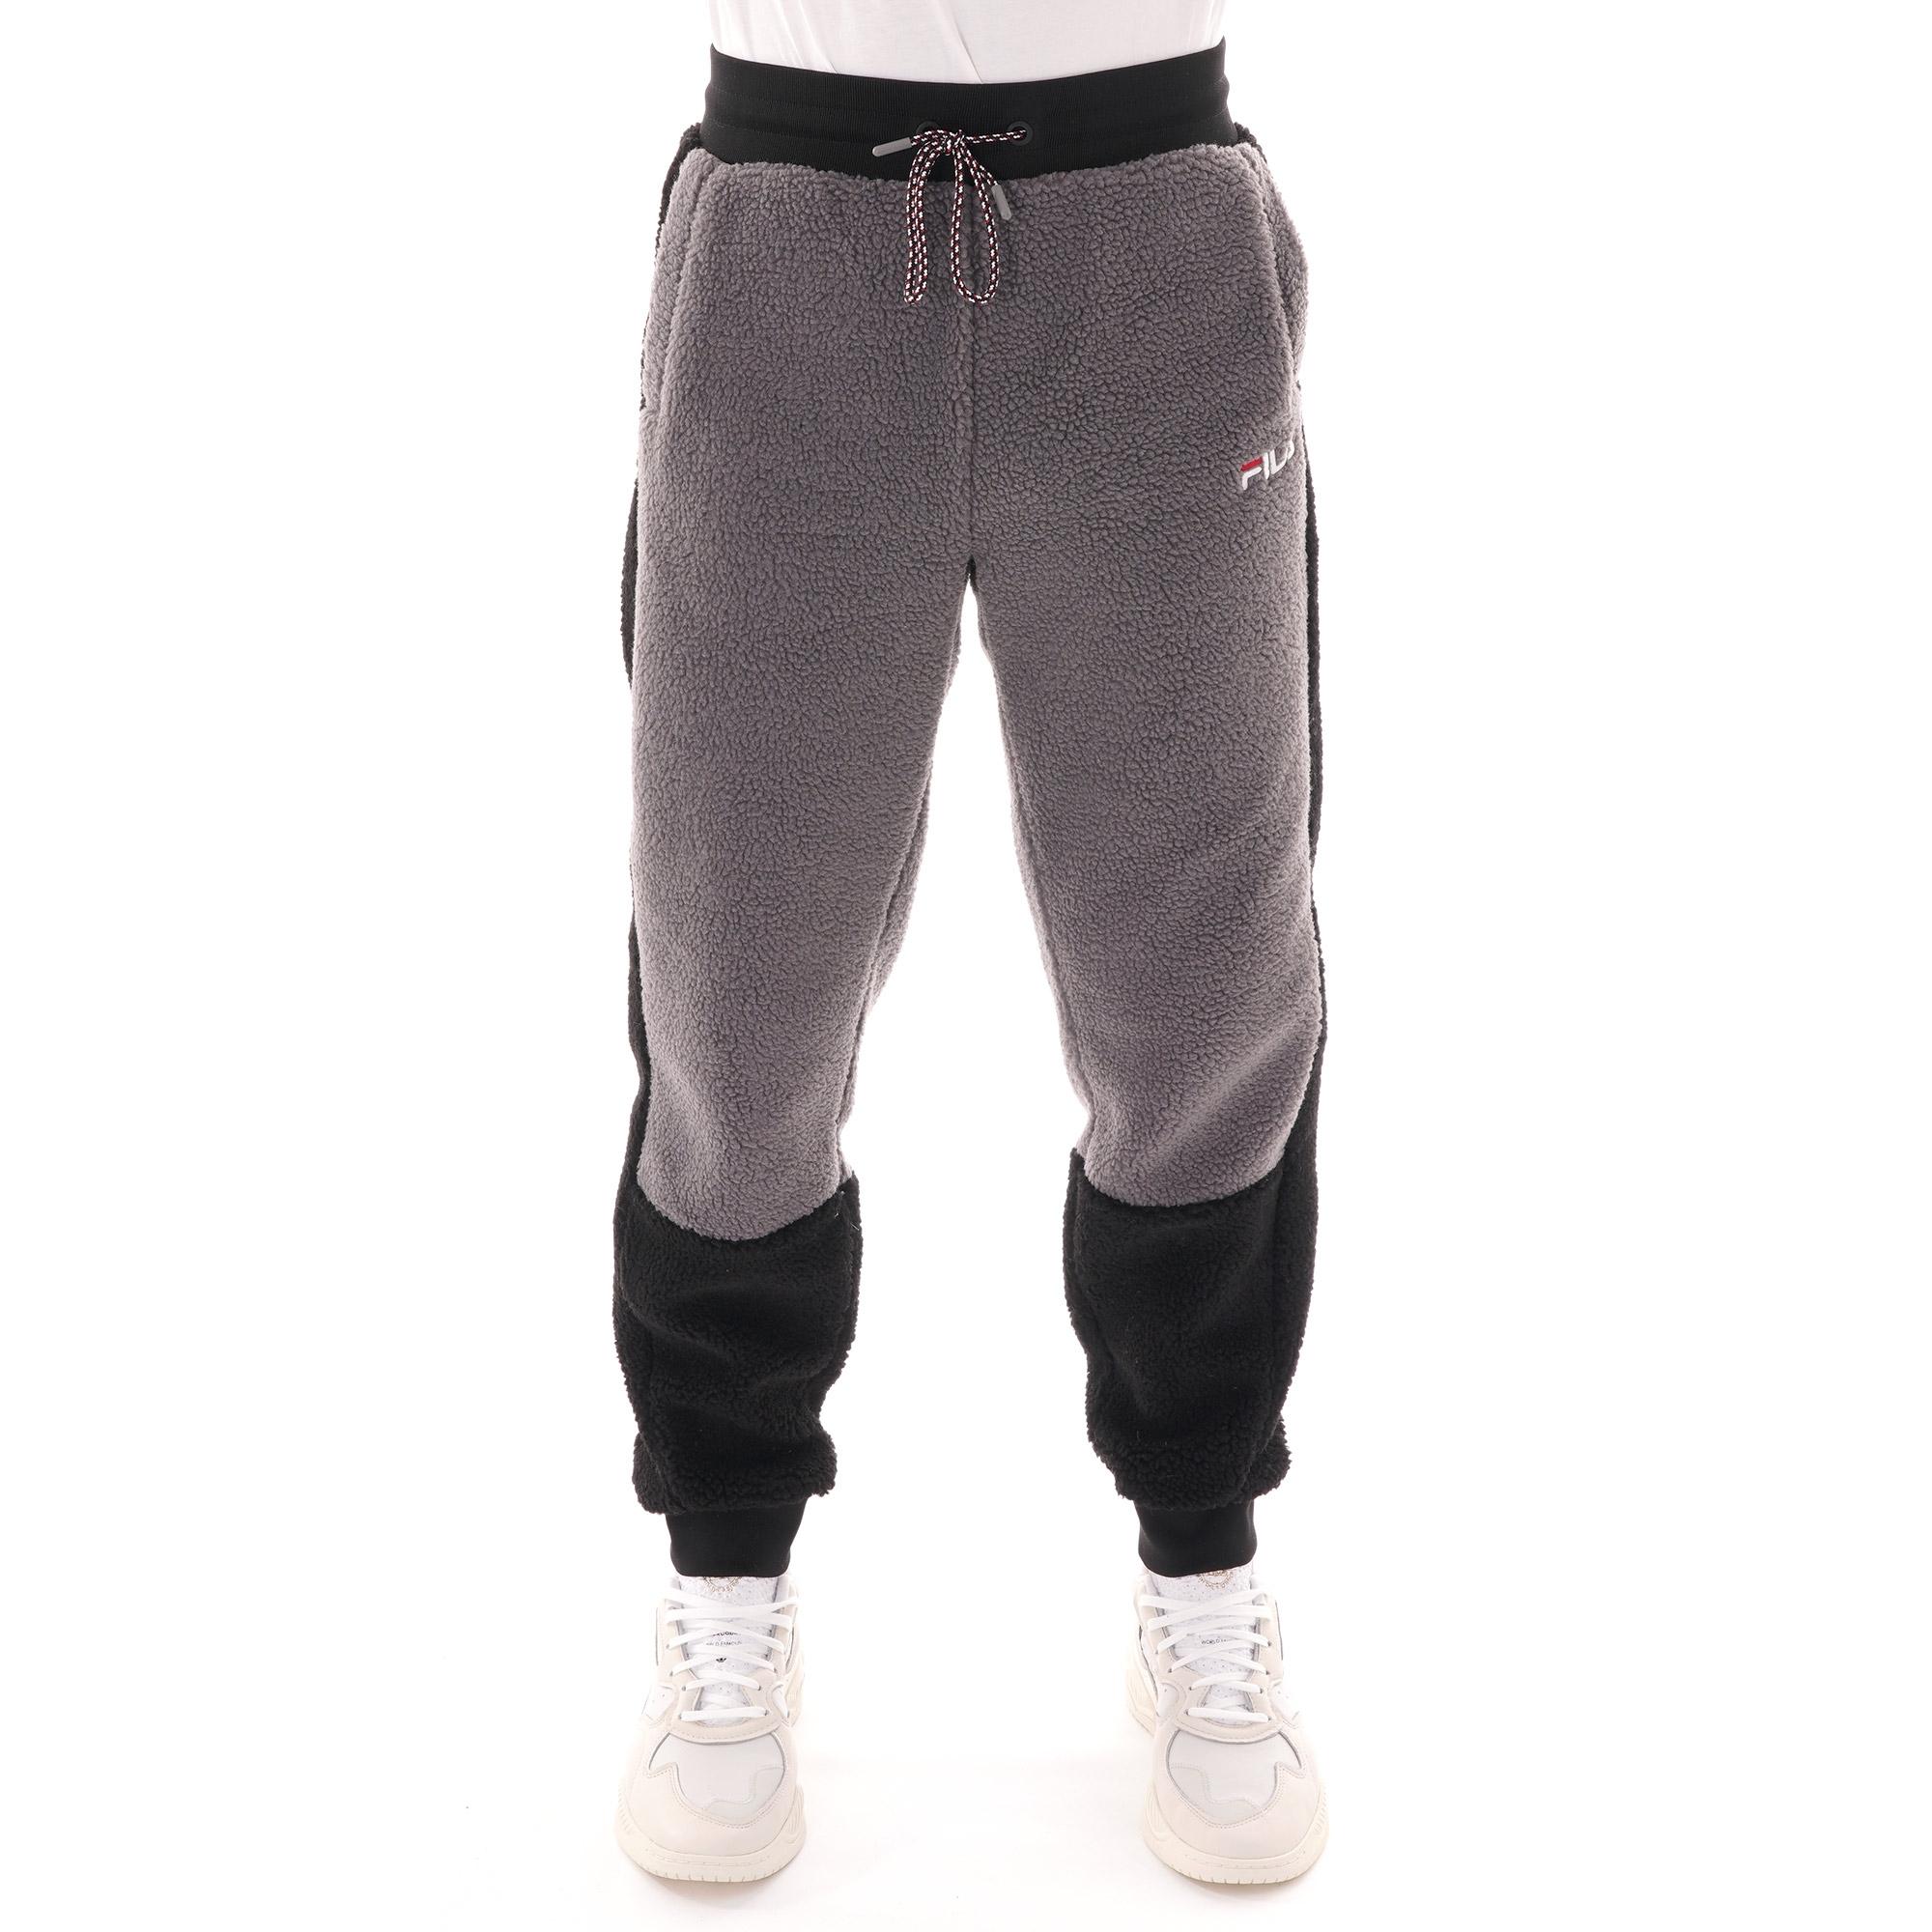 Fila Vintage Camillo Sherpa Track Pants Black